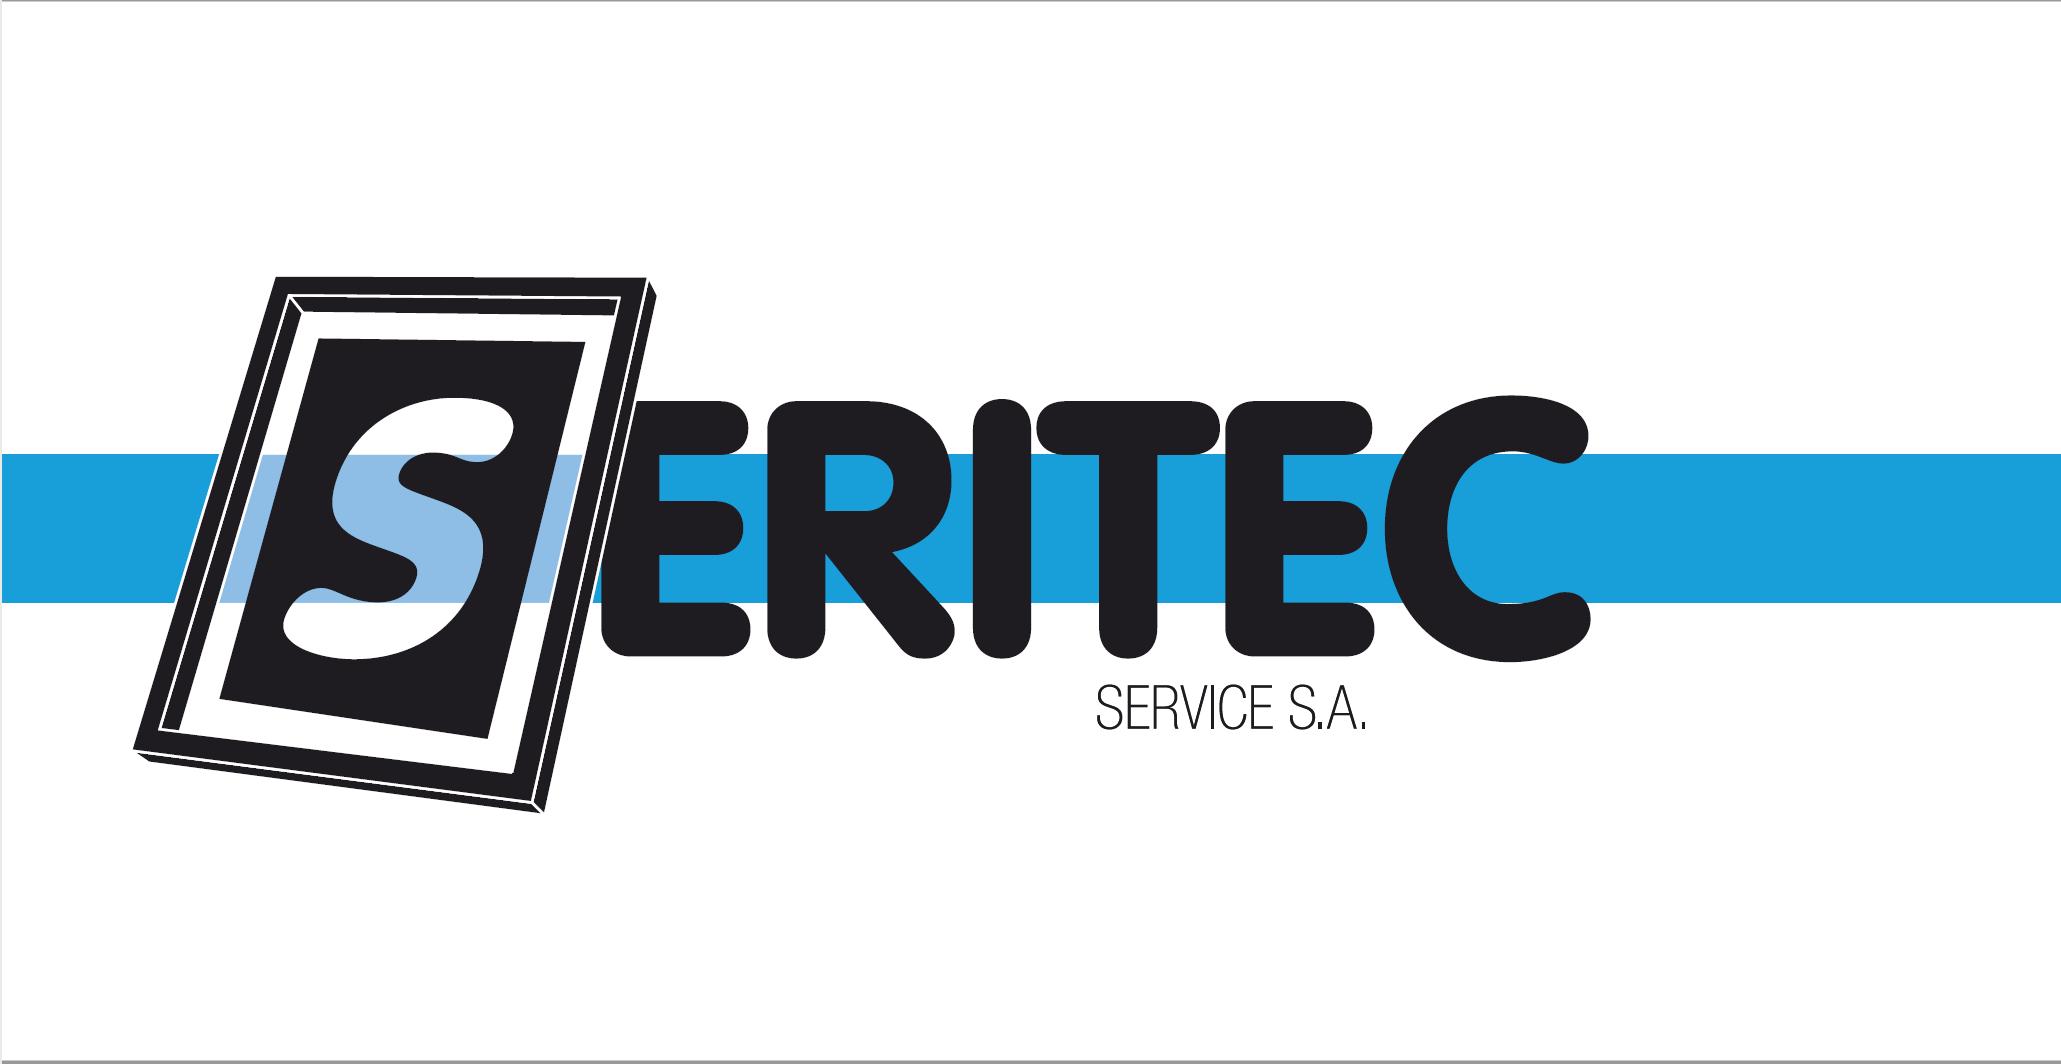 Click image to go to Seritec